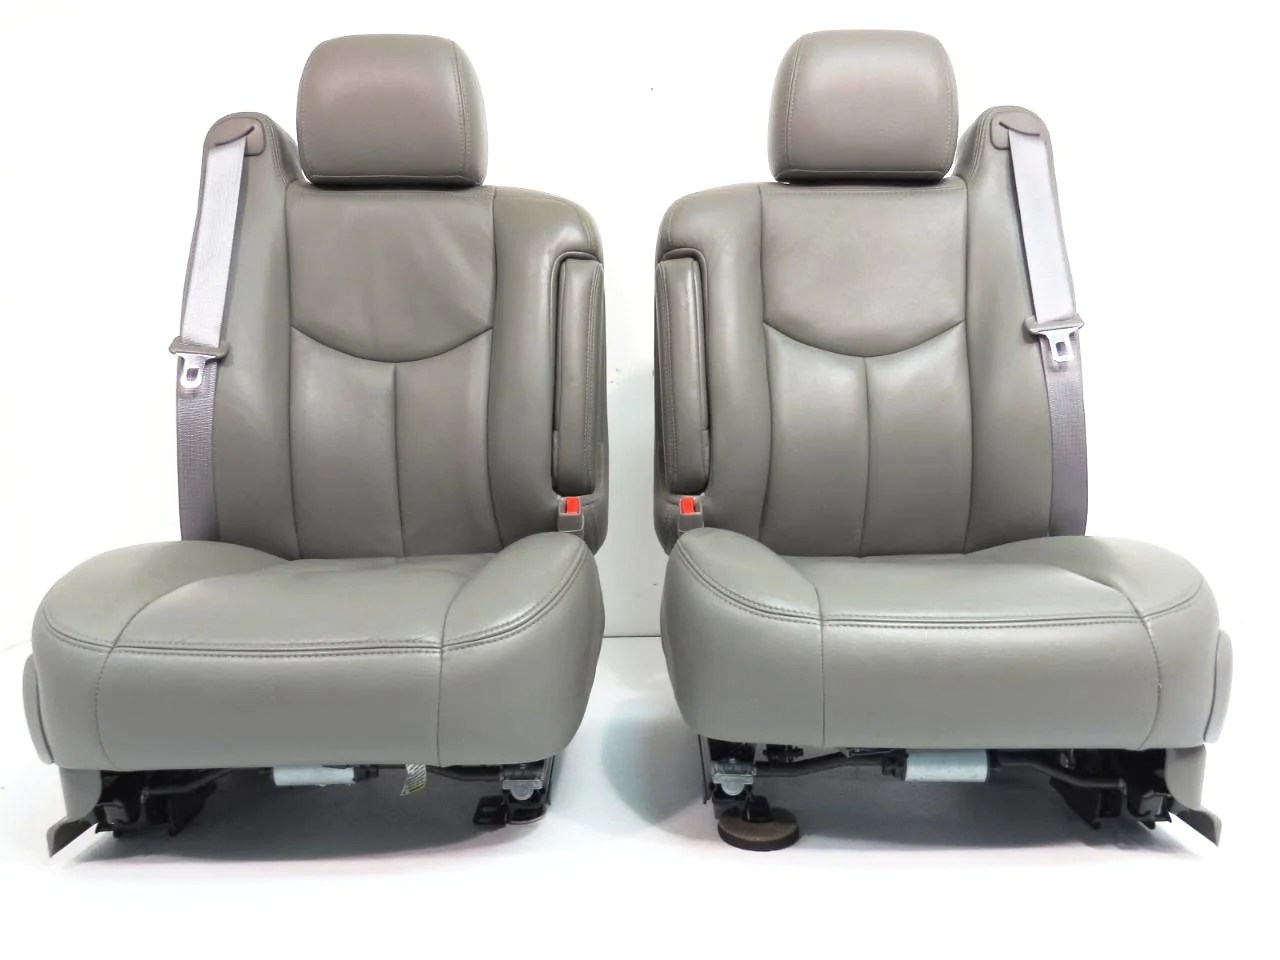 hight resolution of  chevy gmc silverado sierra tahoe yukon suburban oem leather seats pewter grey 2000 2001 2002 2003